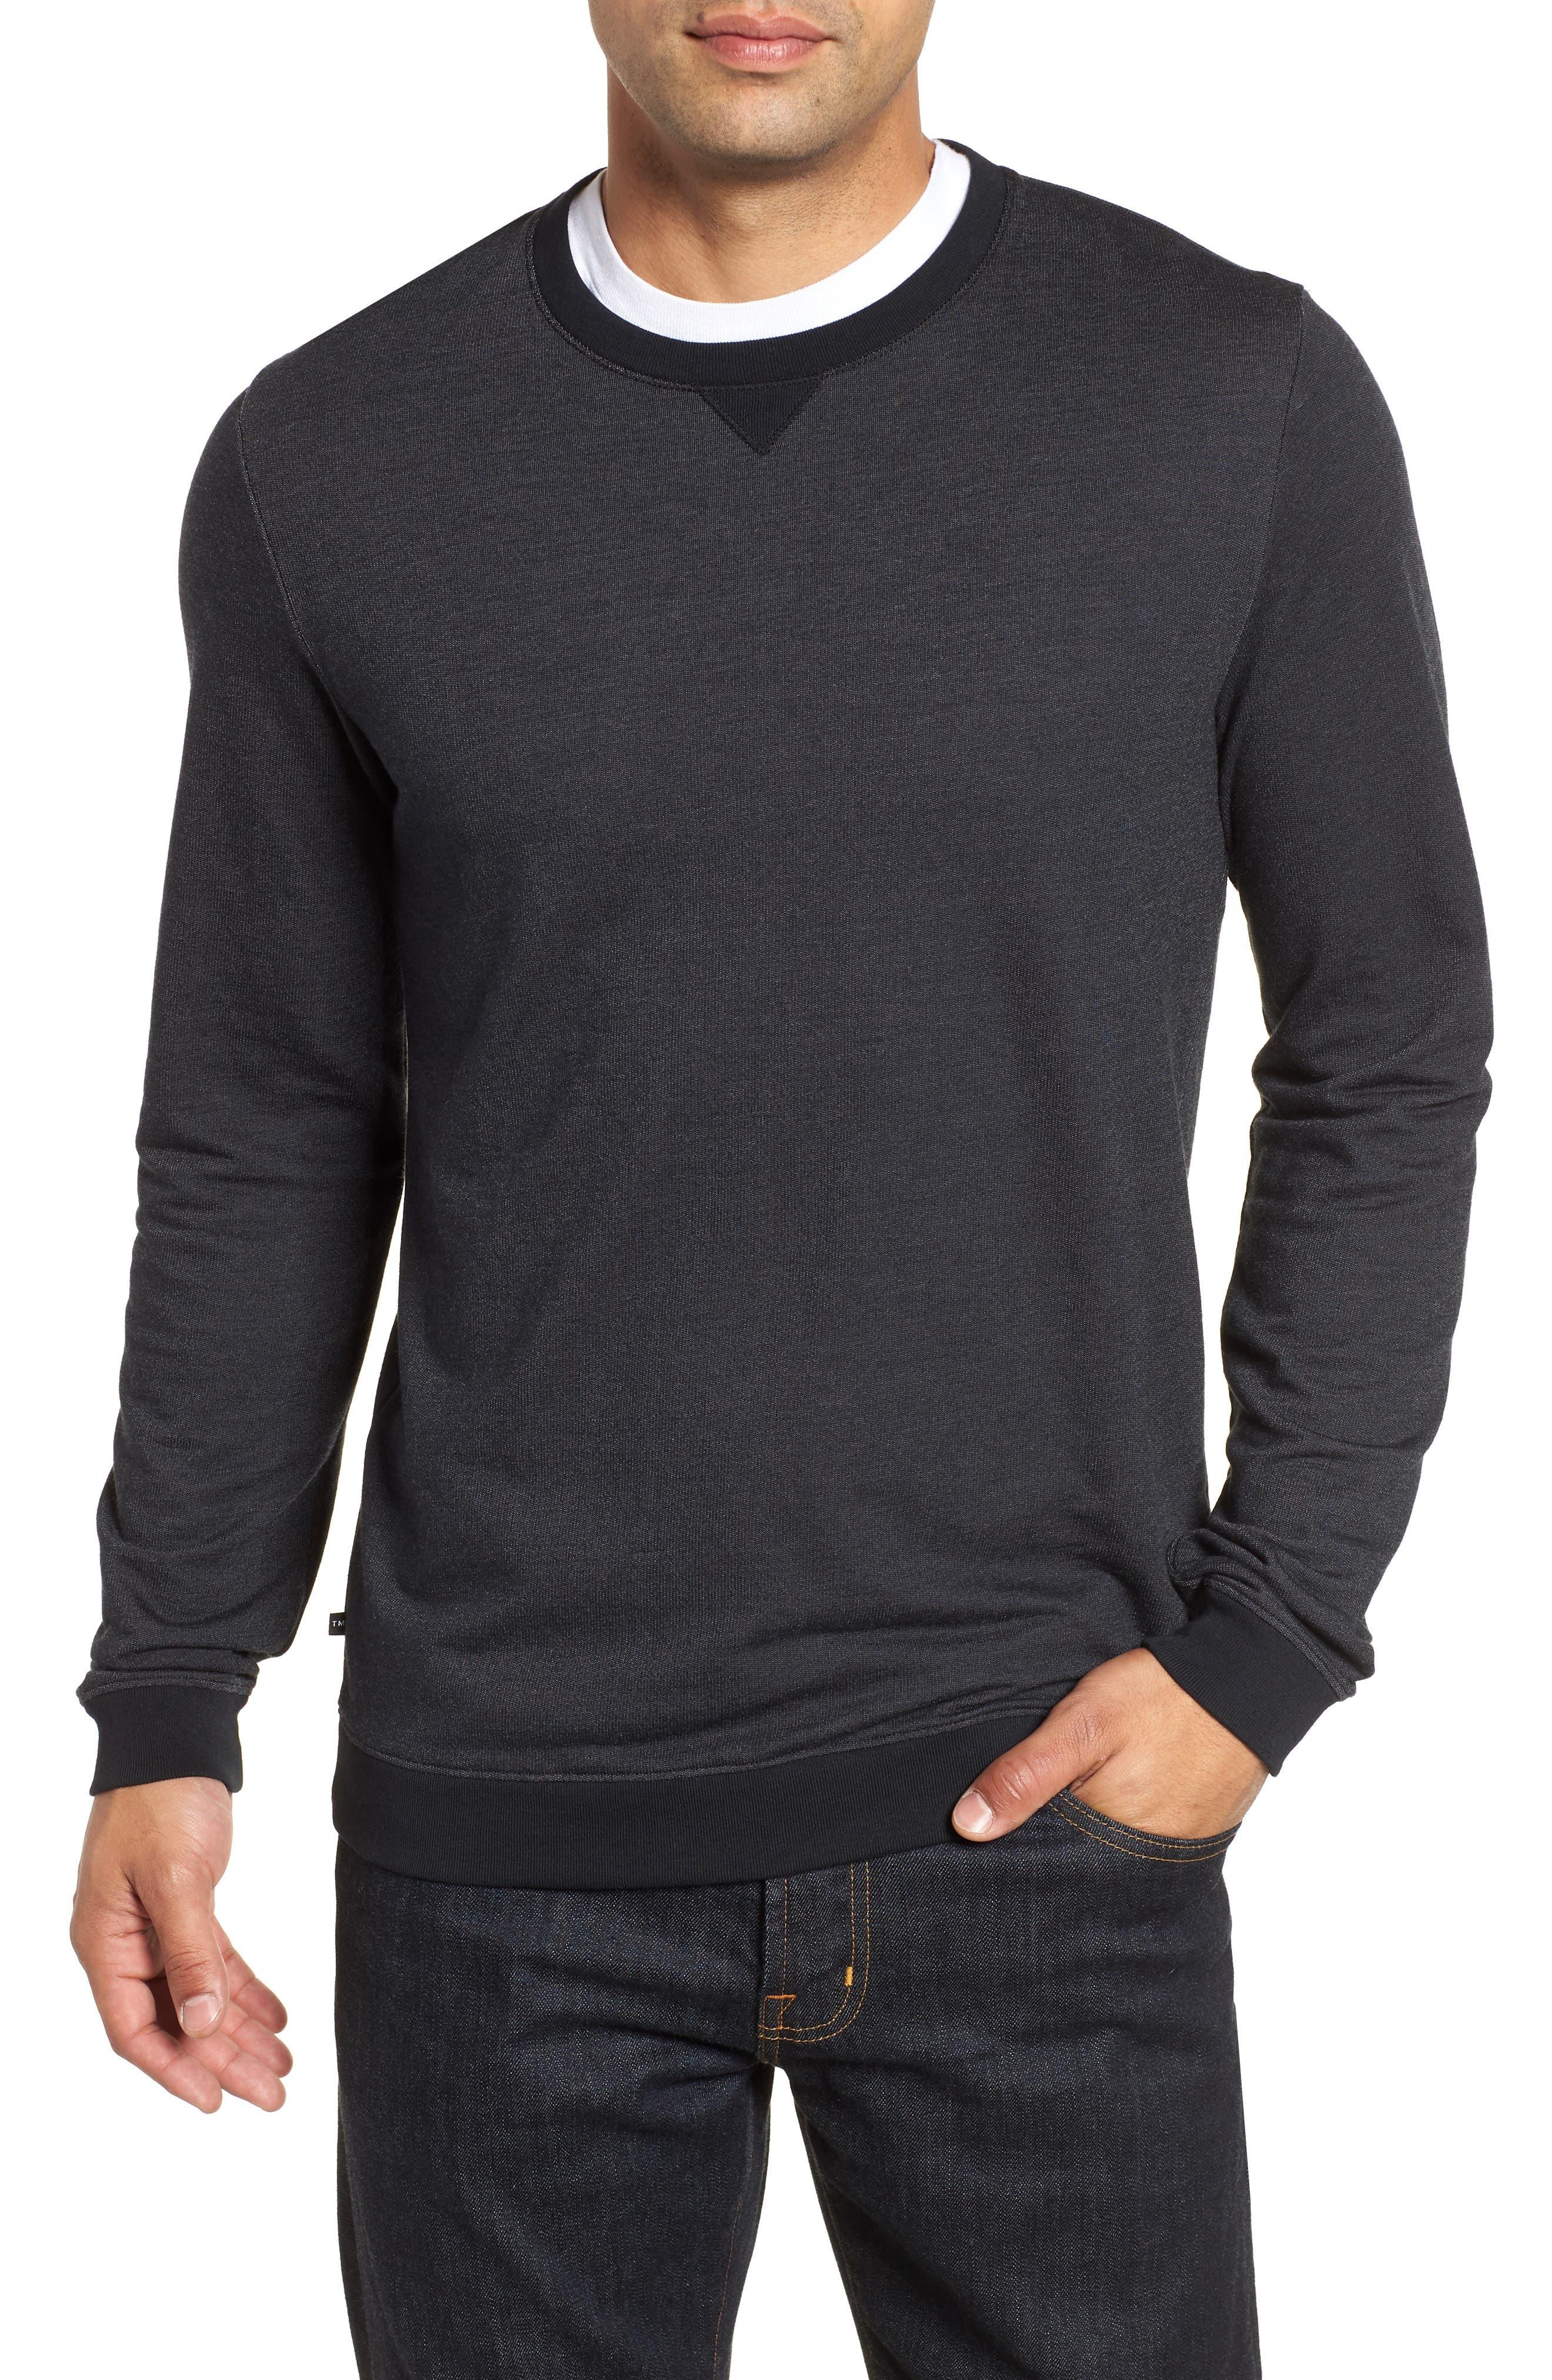 Fink Sweatshirt,                         Main,                         color, 001